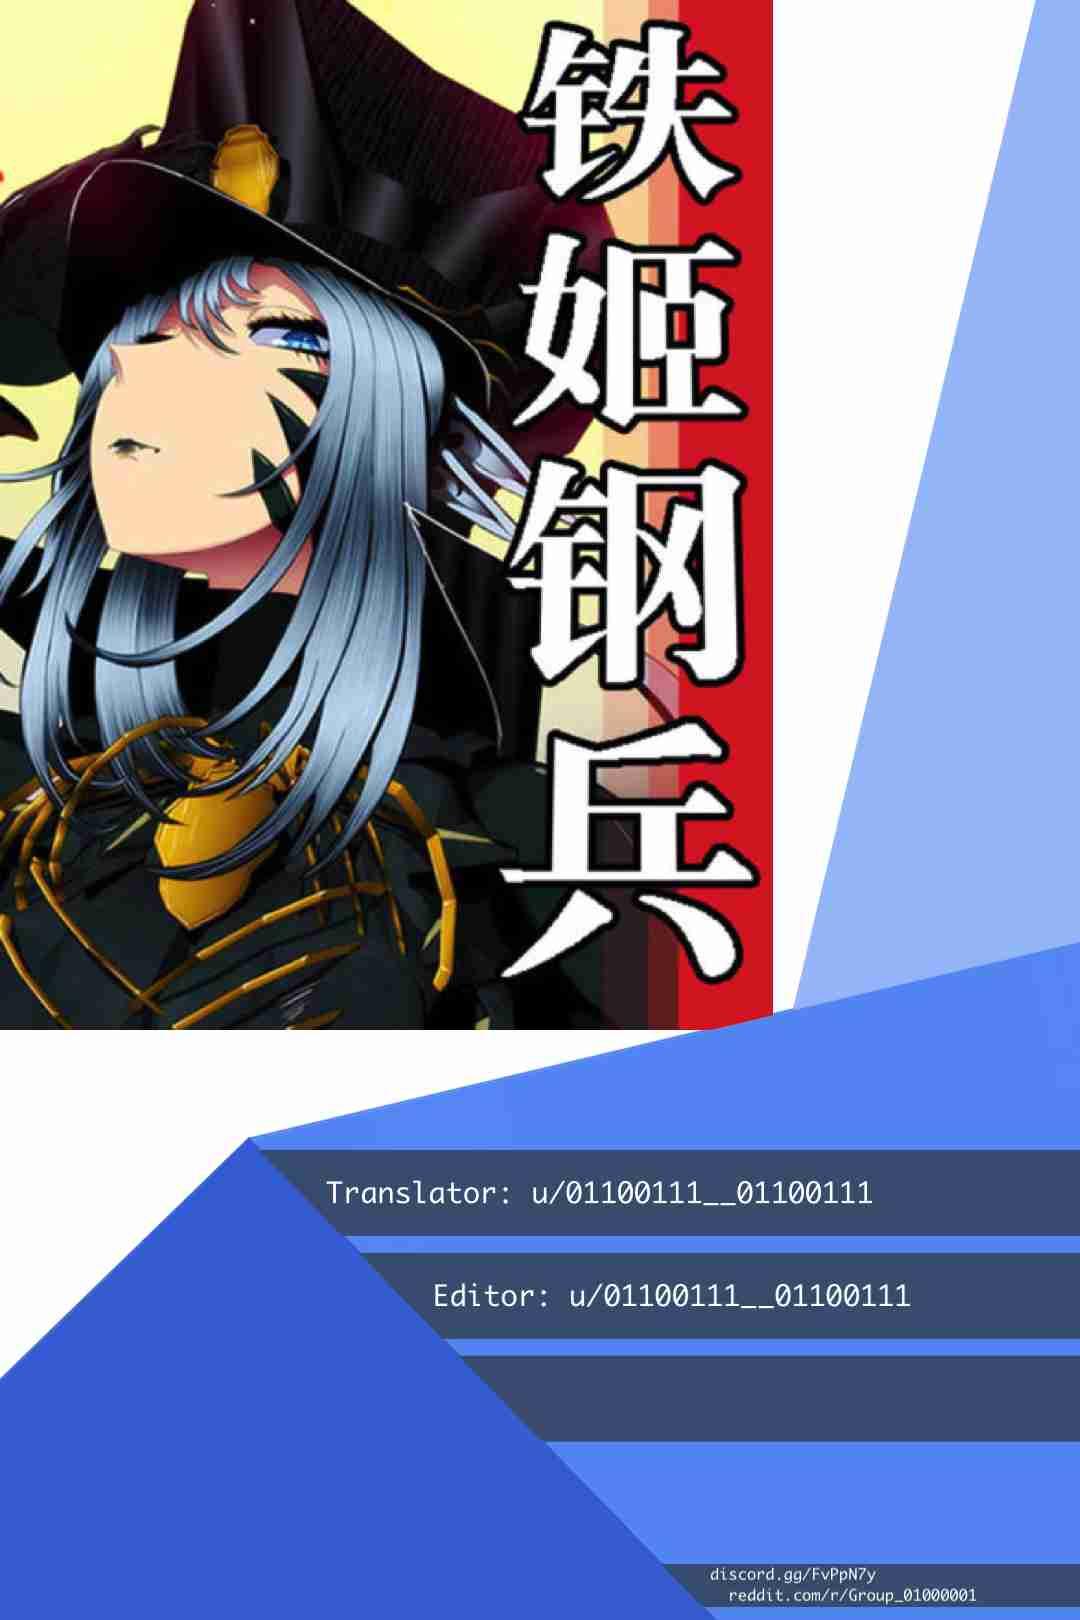 https://manga.mangadogs.com/comics/pic2/59/24443/767707/16f8455ffee11d28c48dca19d52ab537.jpg Page 1